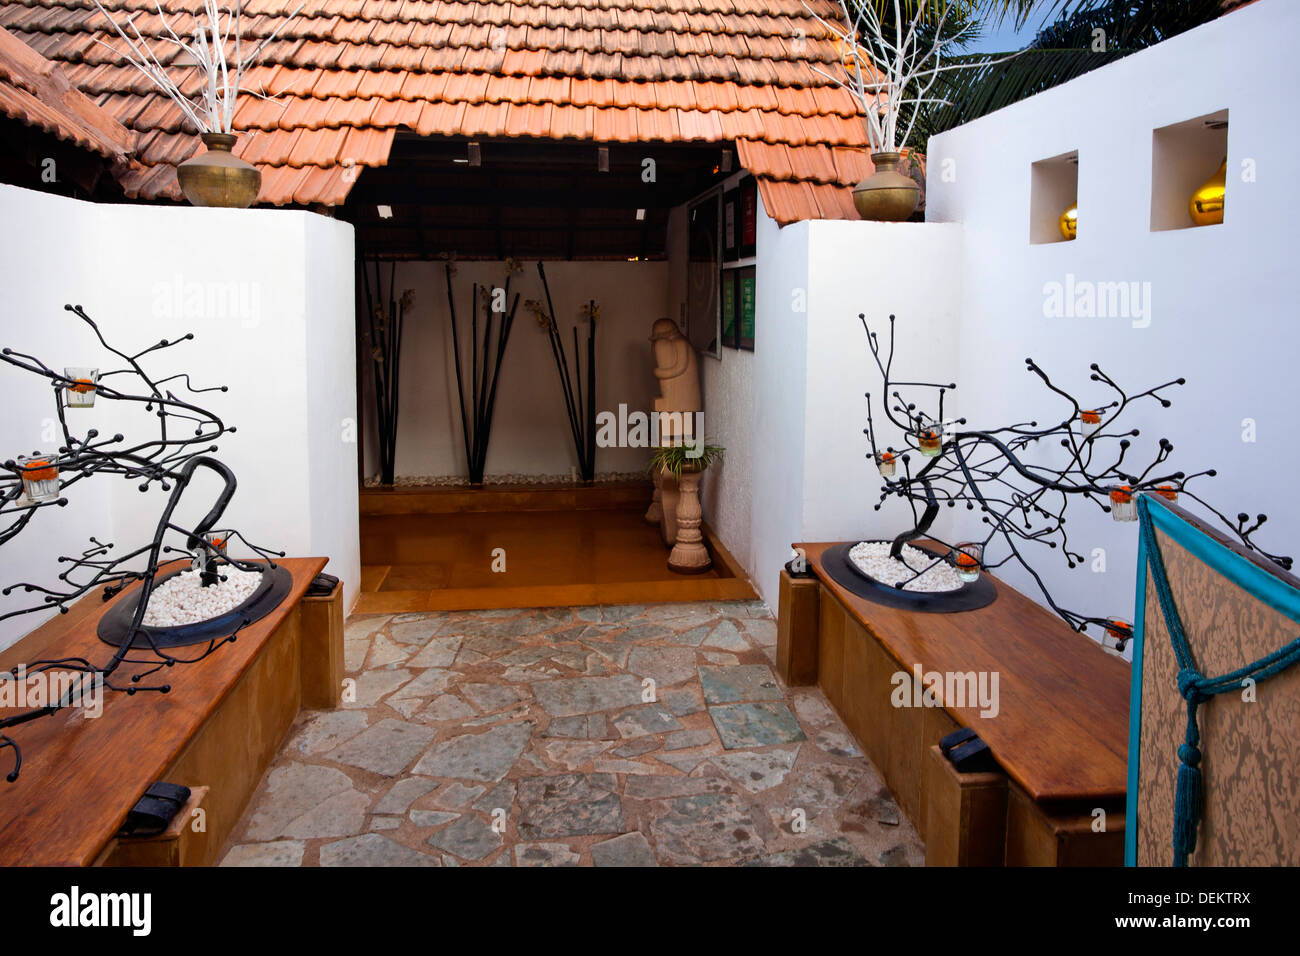 Courtyard of a restaurant, A Reverie, Calangute, North Goa, Goa, India - Stock Image